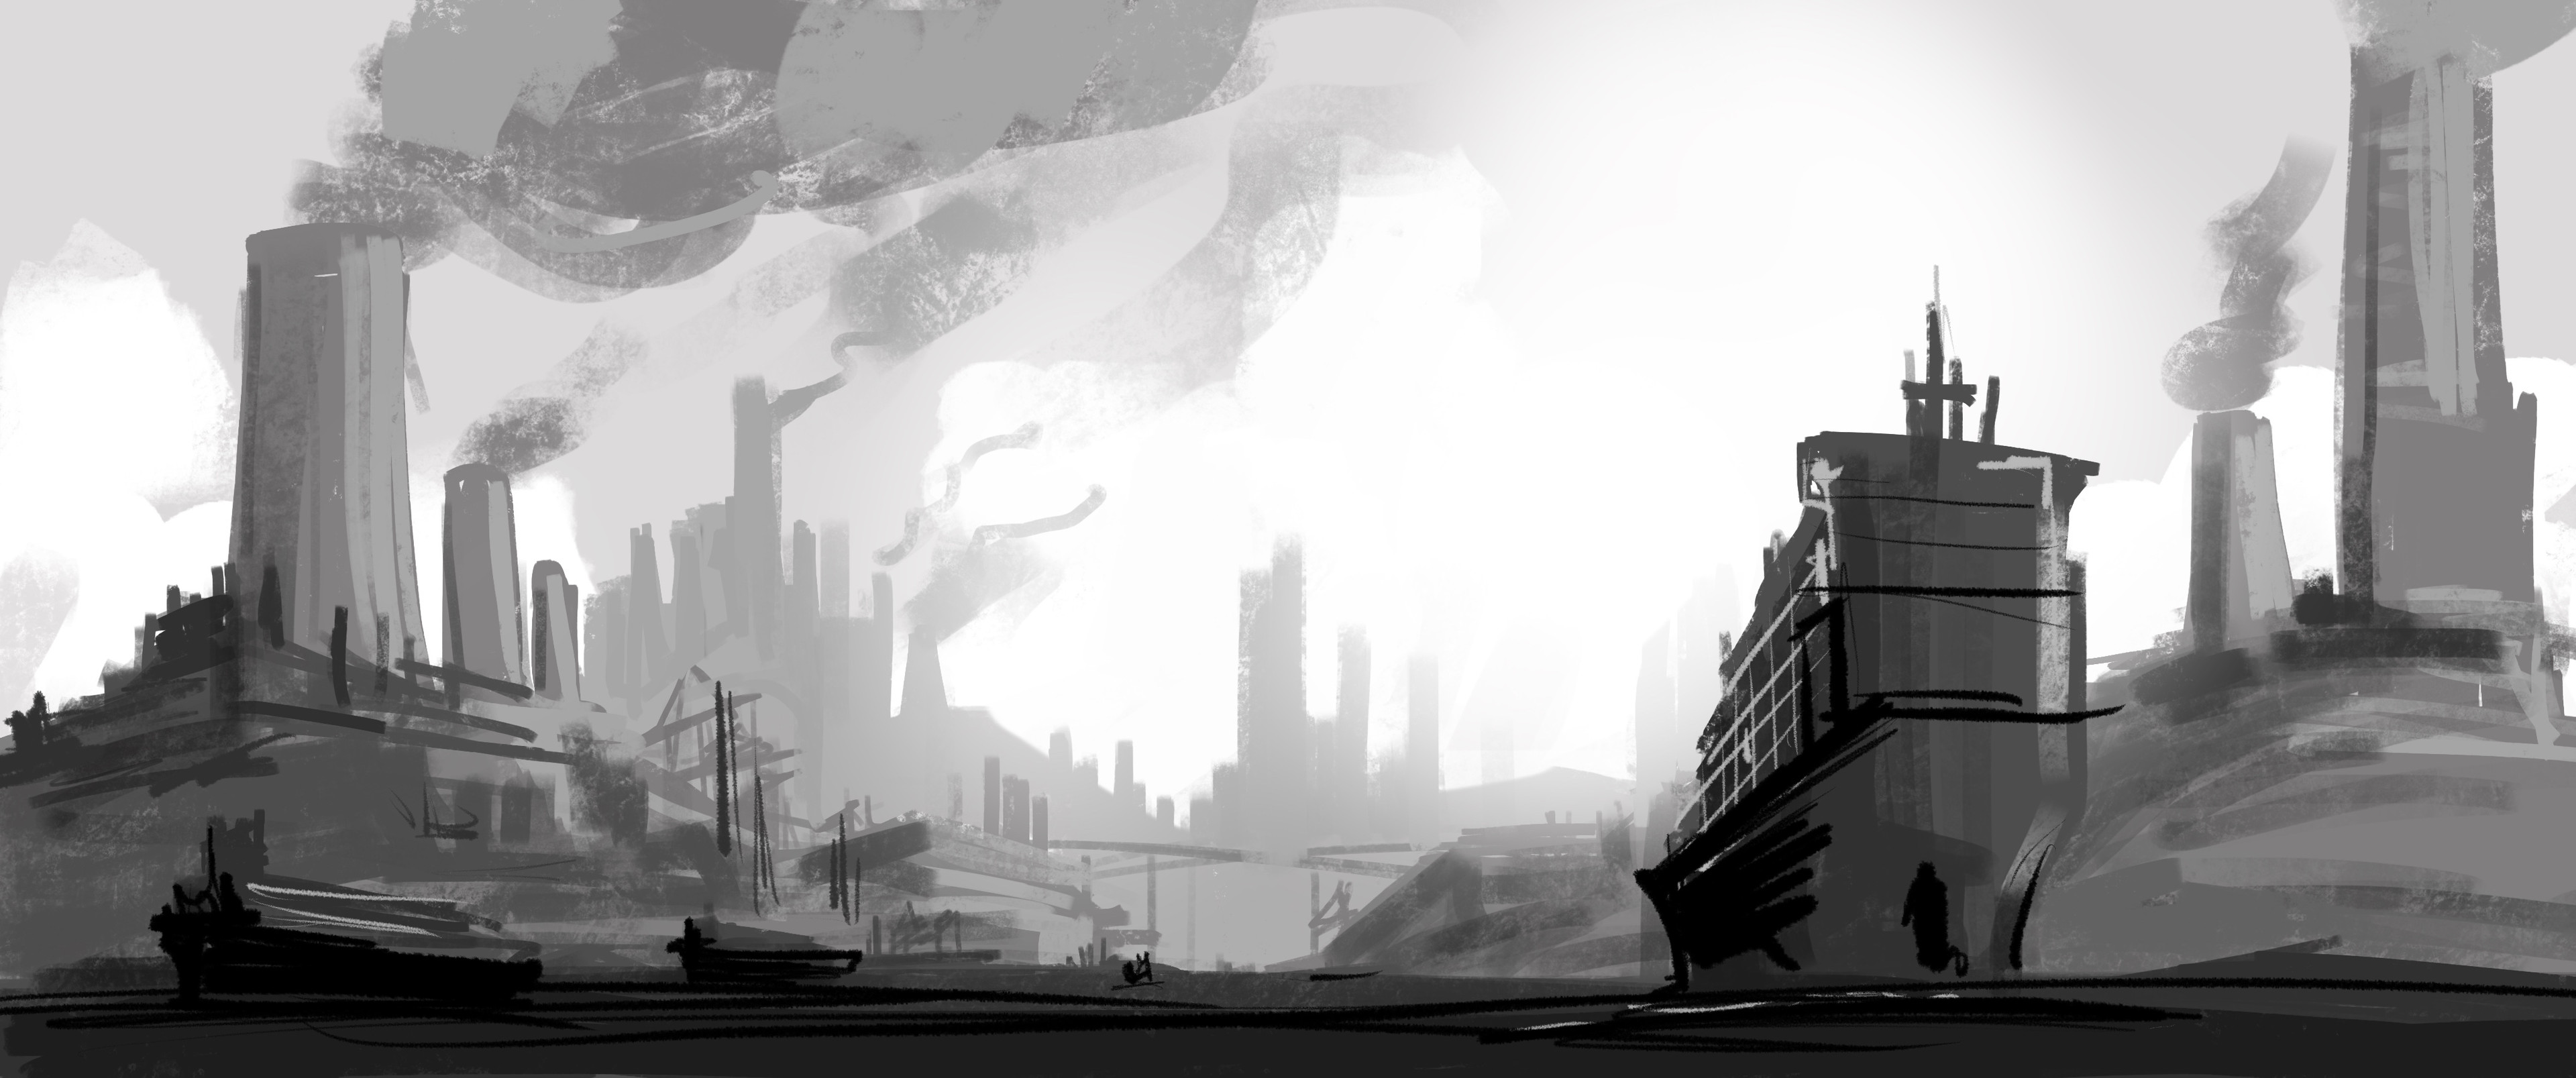 Industrial Island - Grey sketch